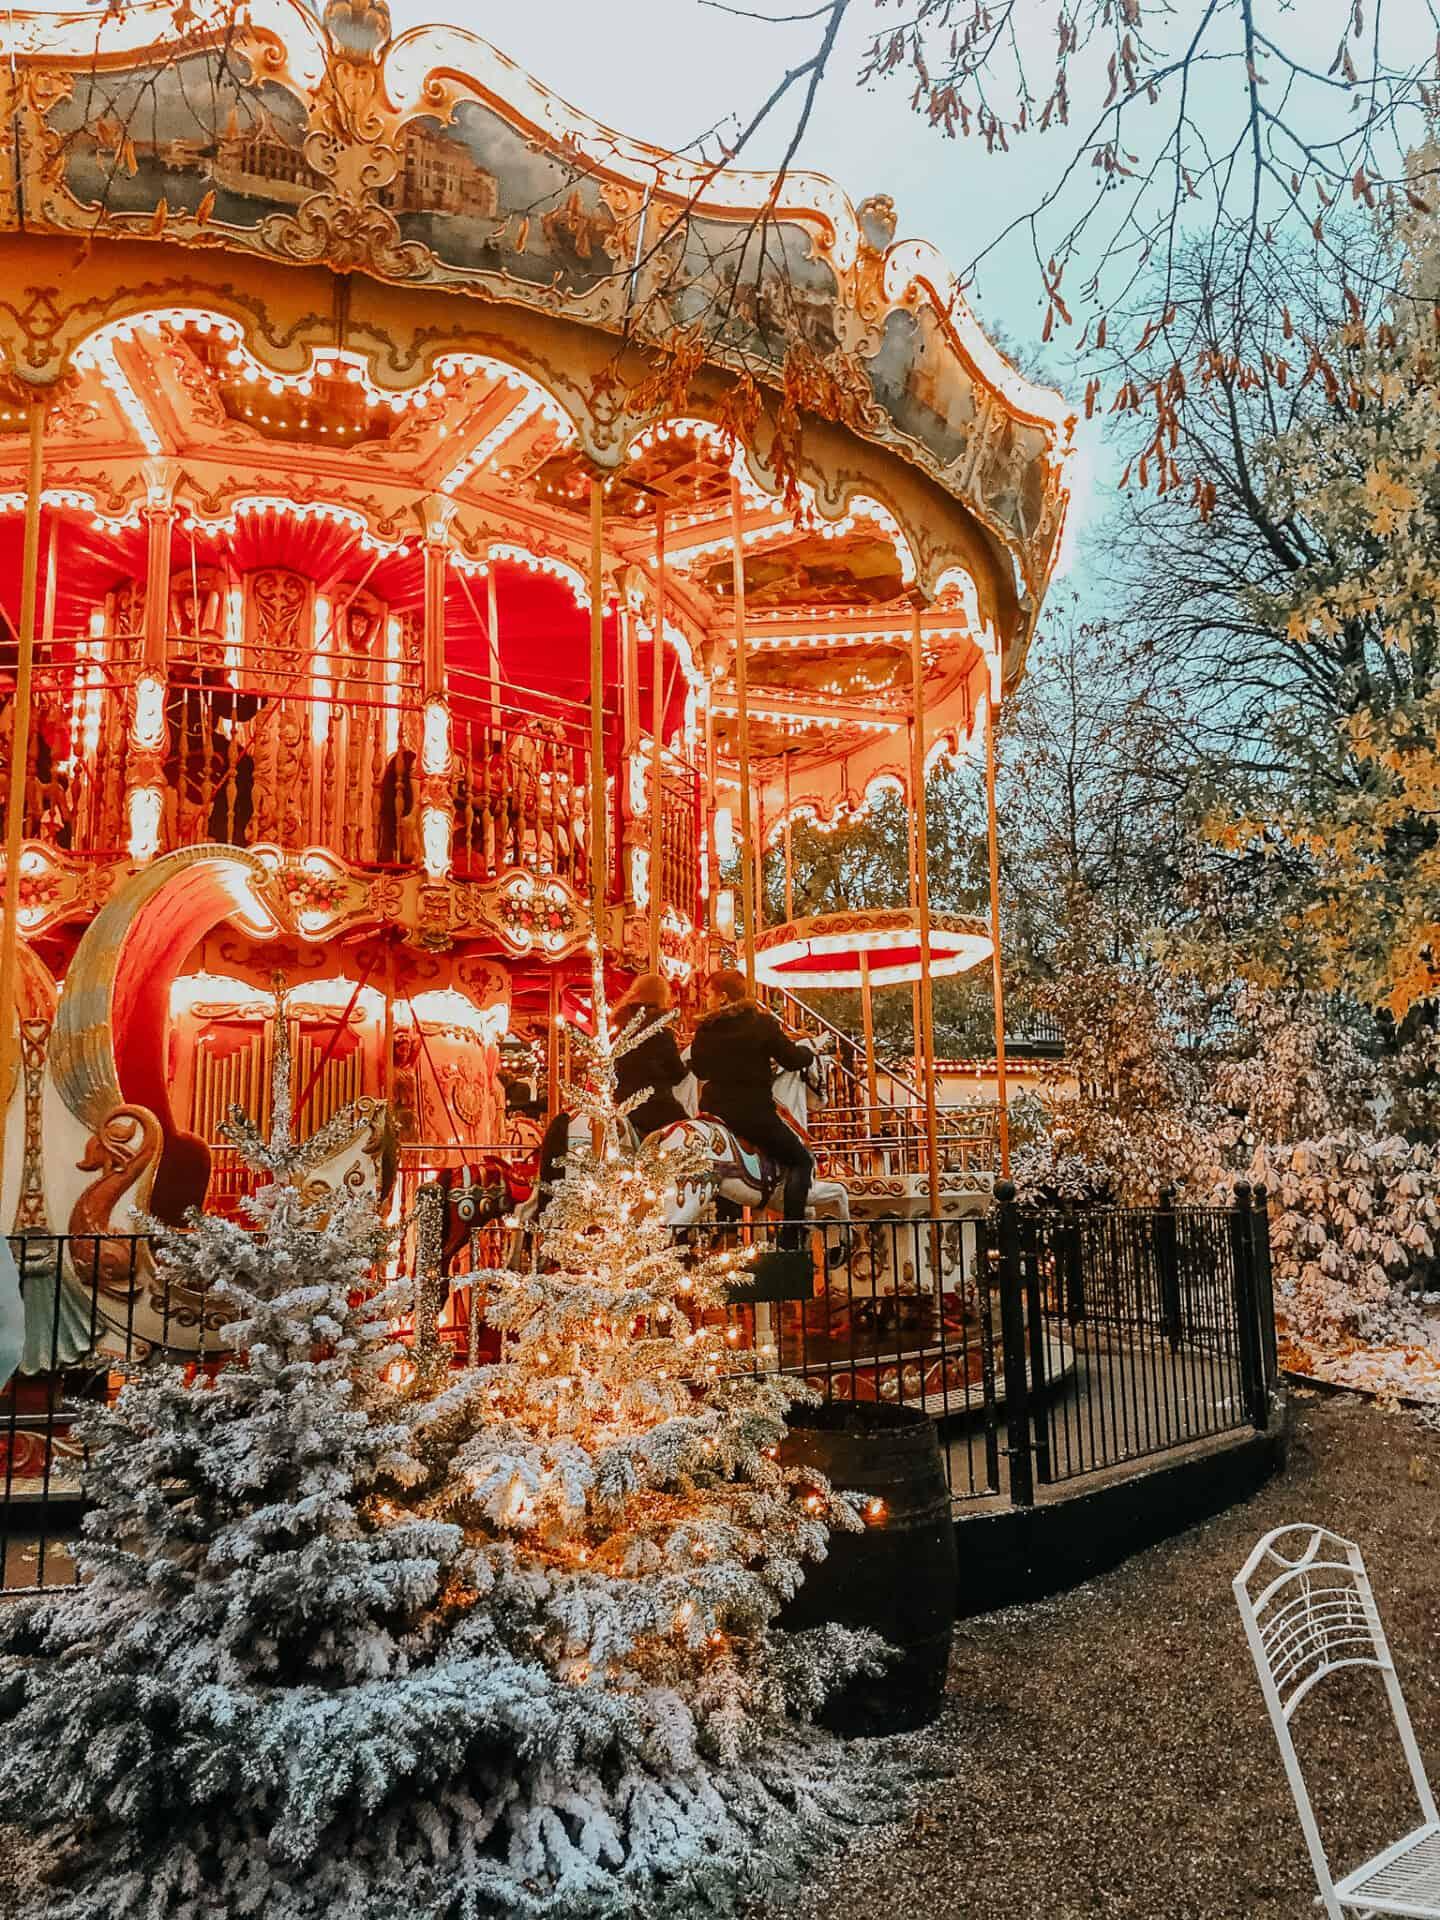 Merry go round at Tivoli Gardens, Copenhagen in winter